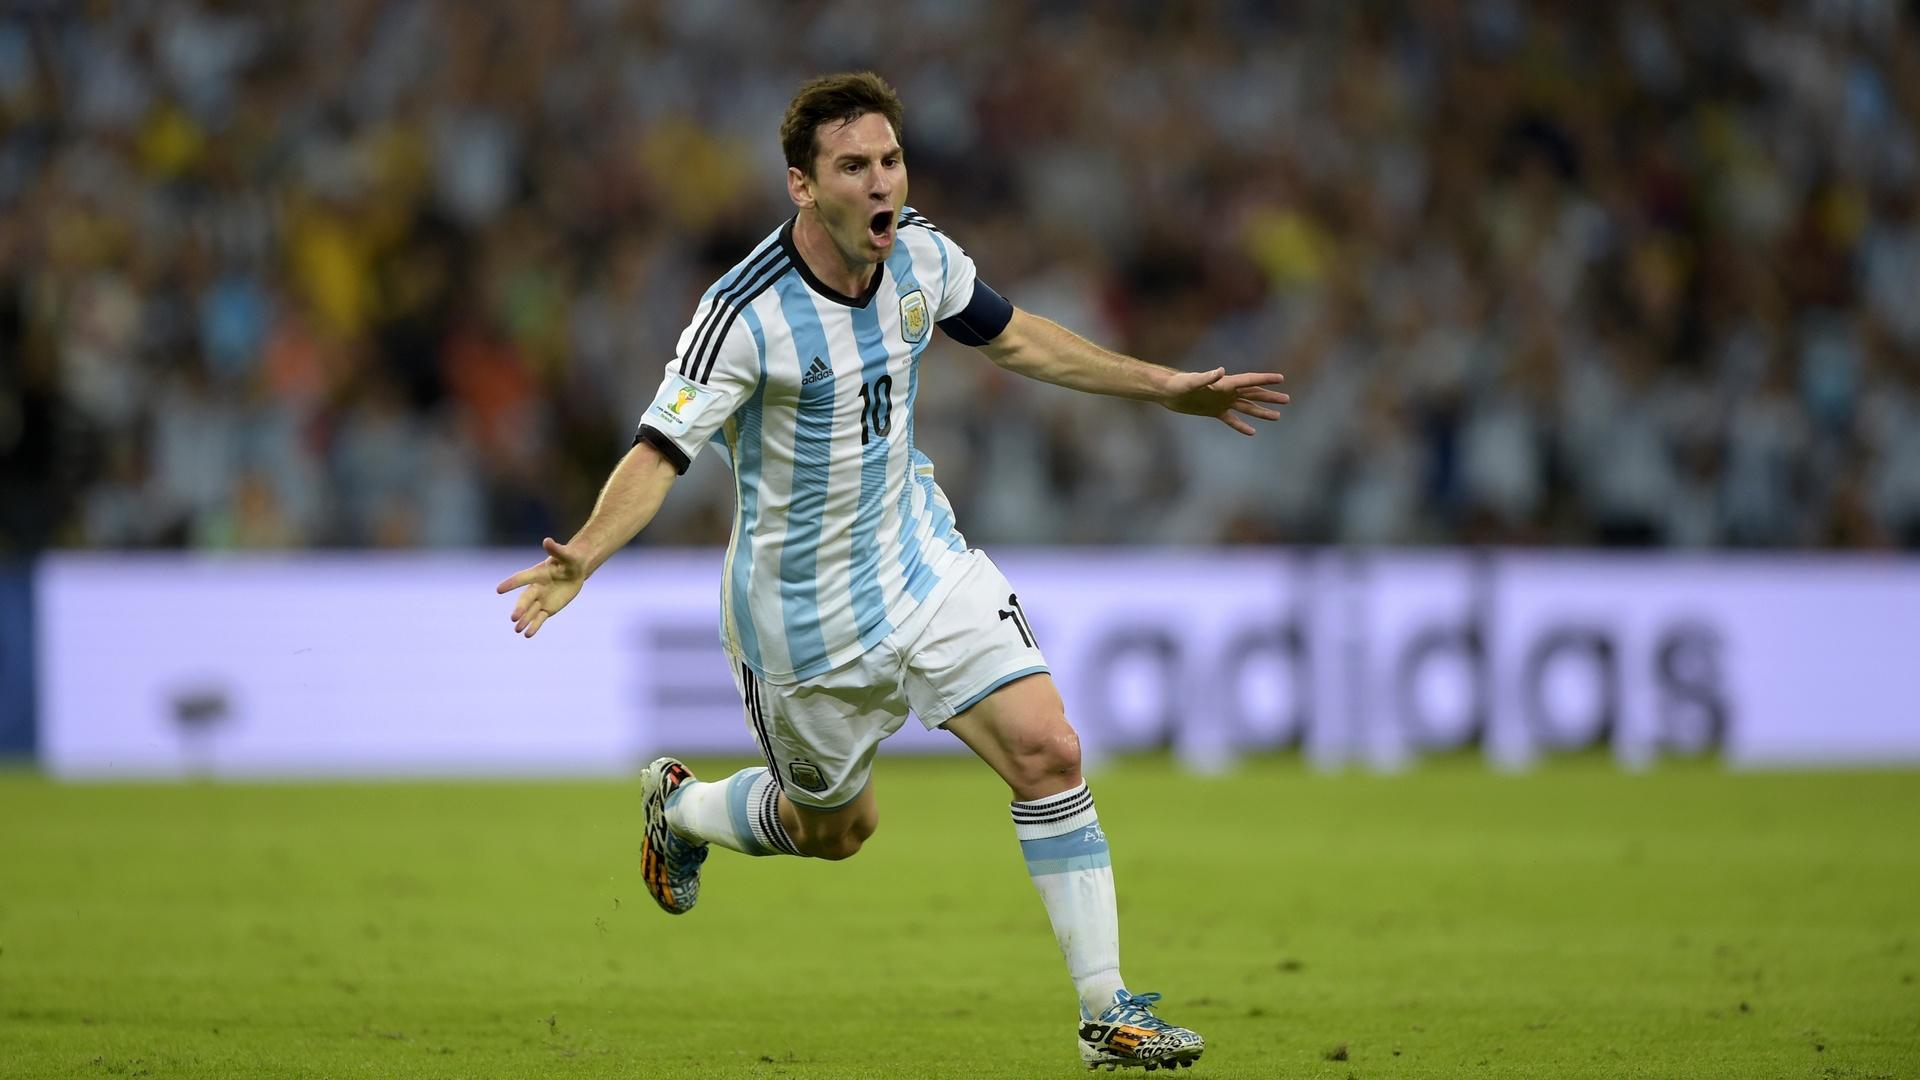 Argentina Football Wallpaper Hd Lionel Messi 1920x1080 Backgrounds Full Hd Pixelstalk Net